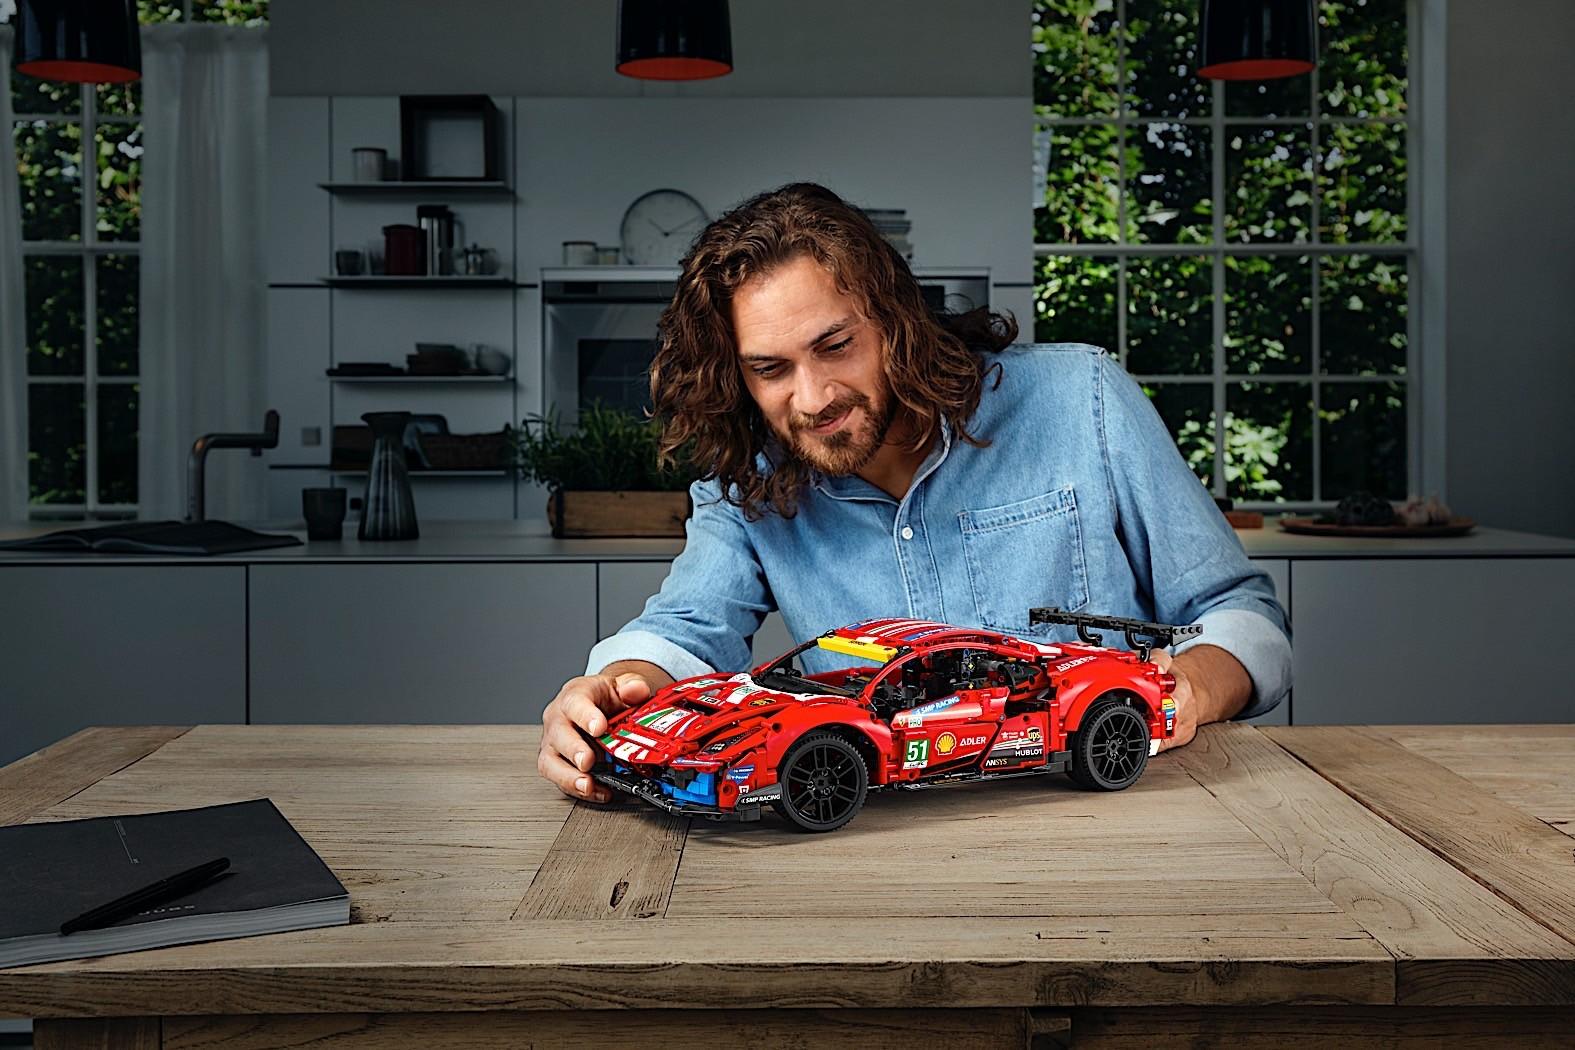 Lego-Technic-Ferrari-488-GTE-AF-Corse-51-10